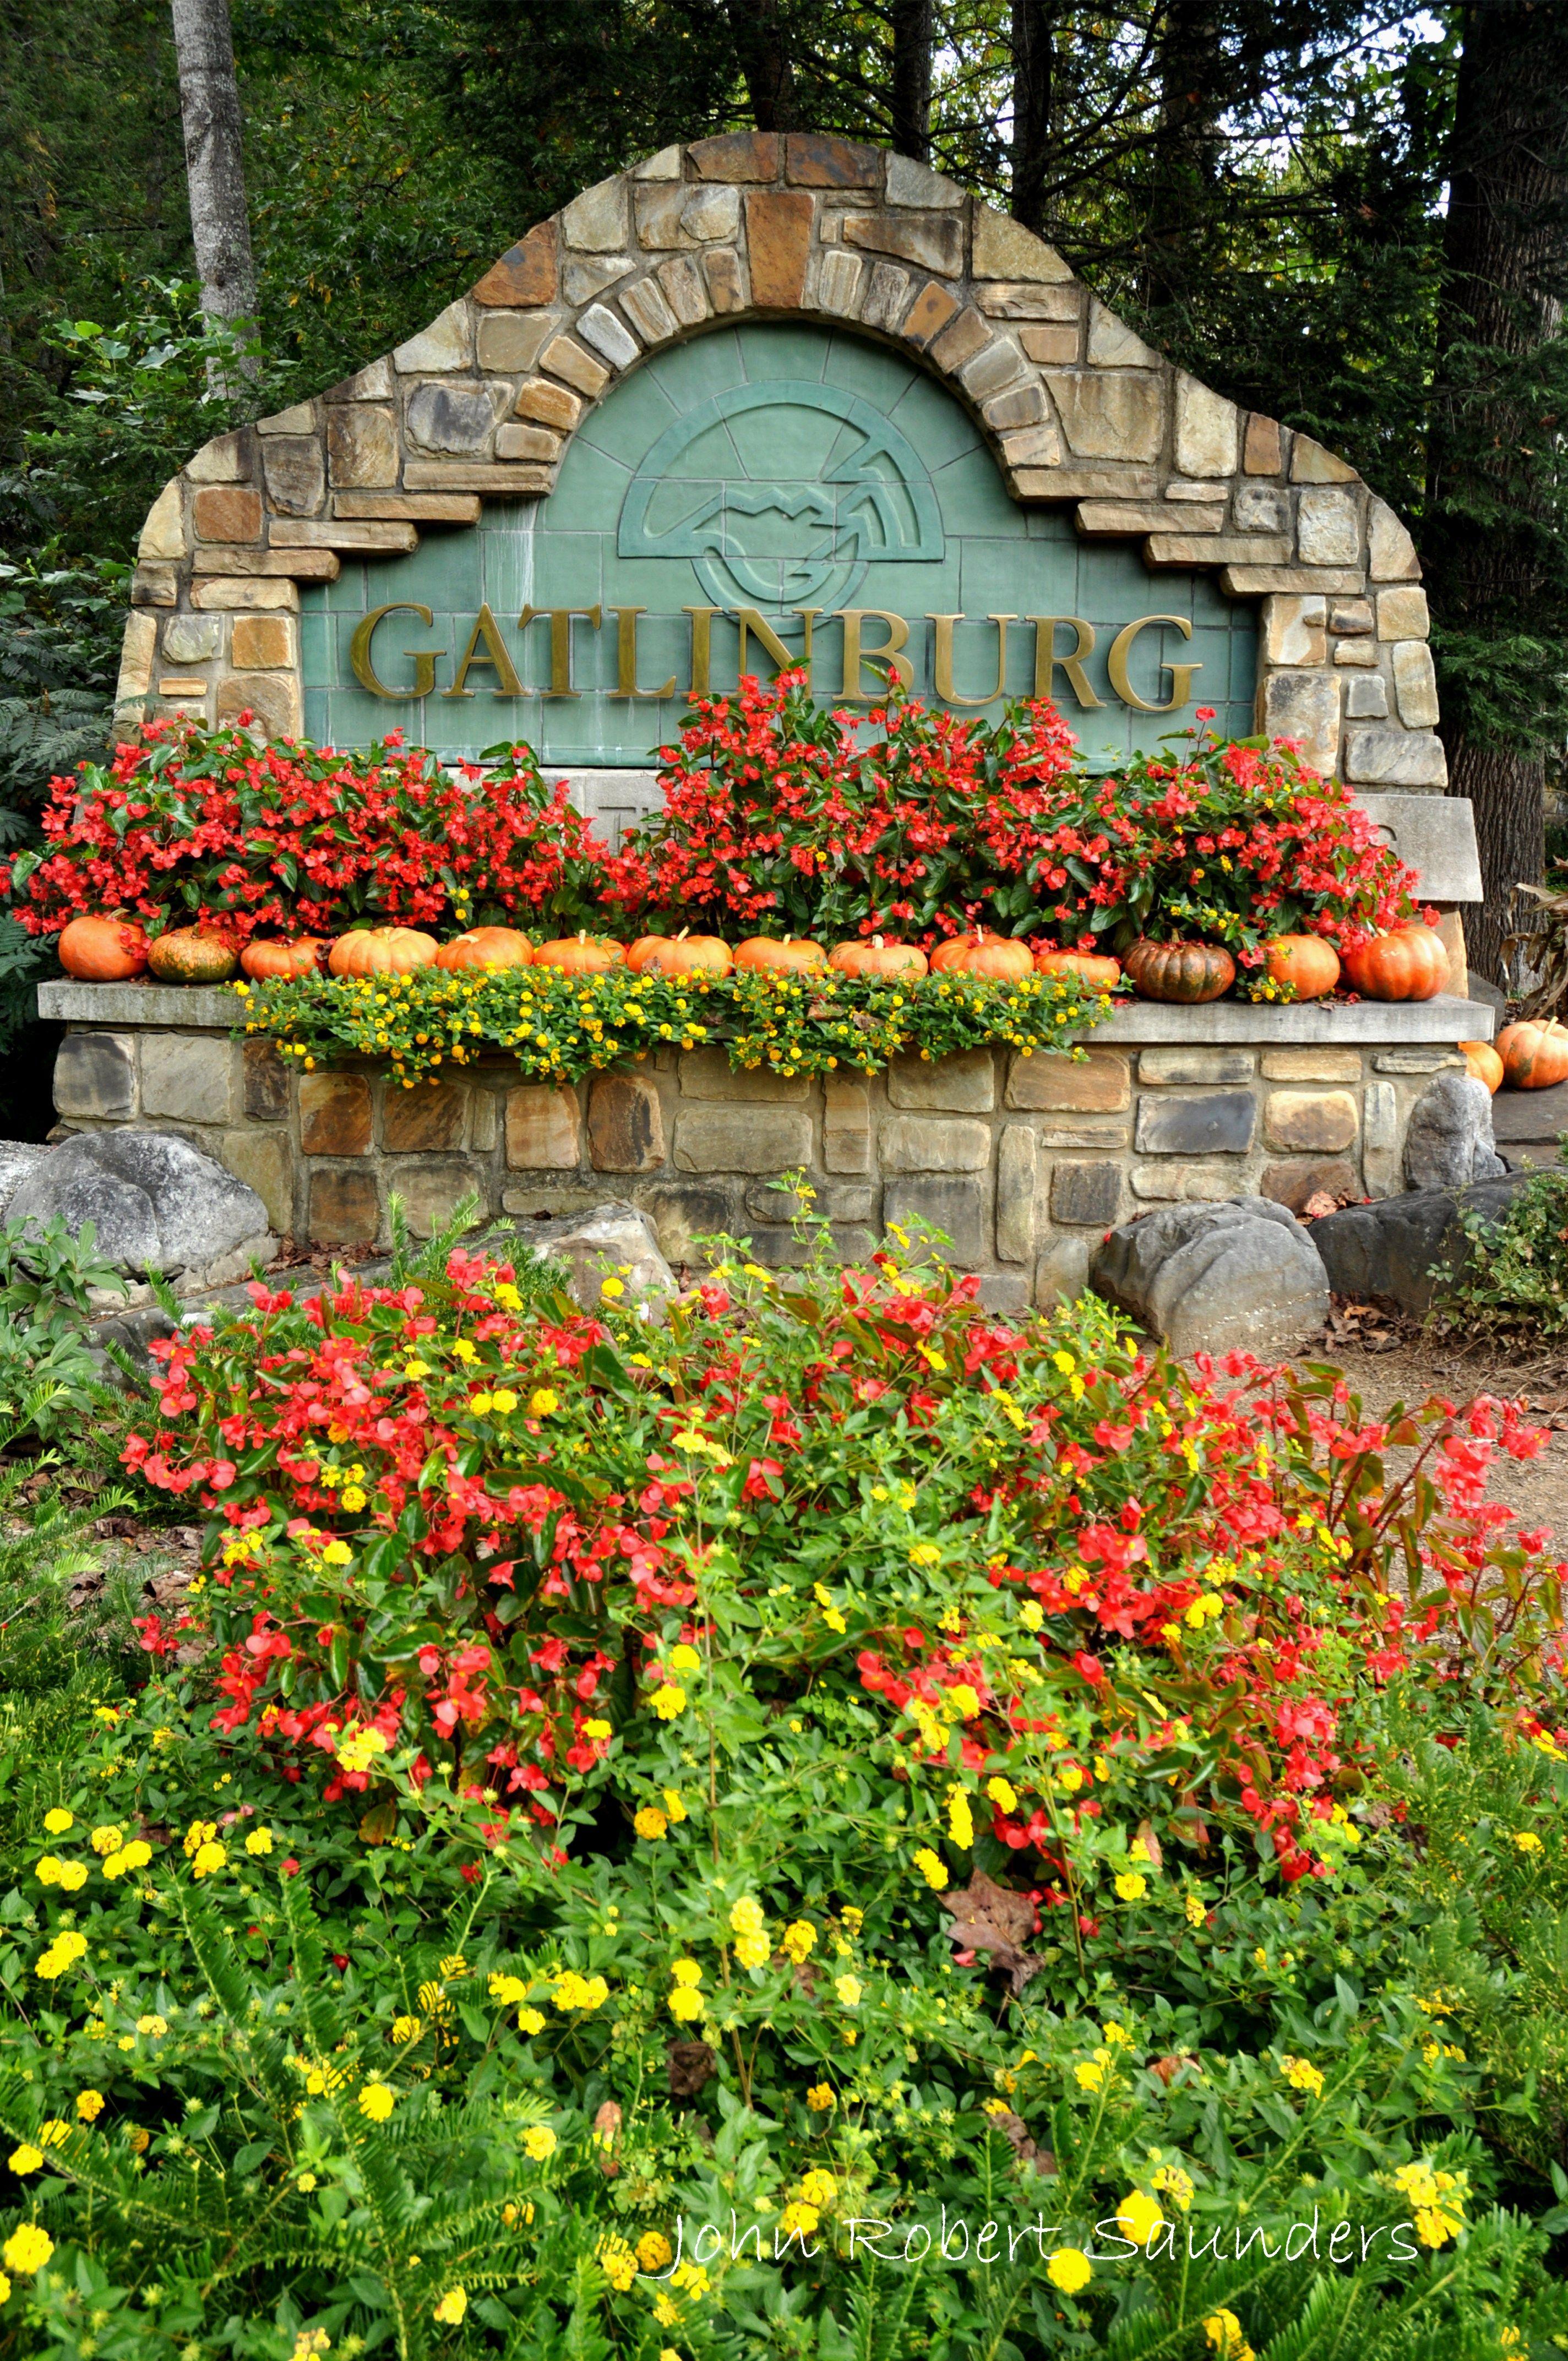 tennessee a in gatlinburg mountain hideaway tn bedroom cabins cabin